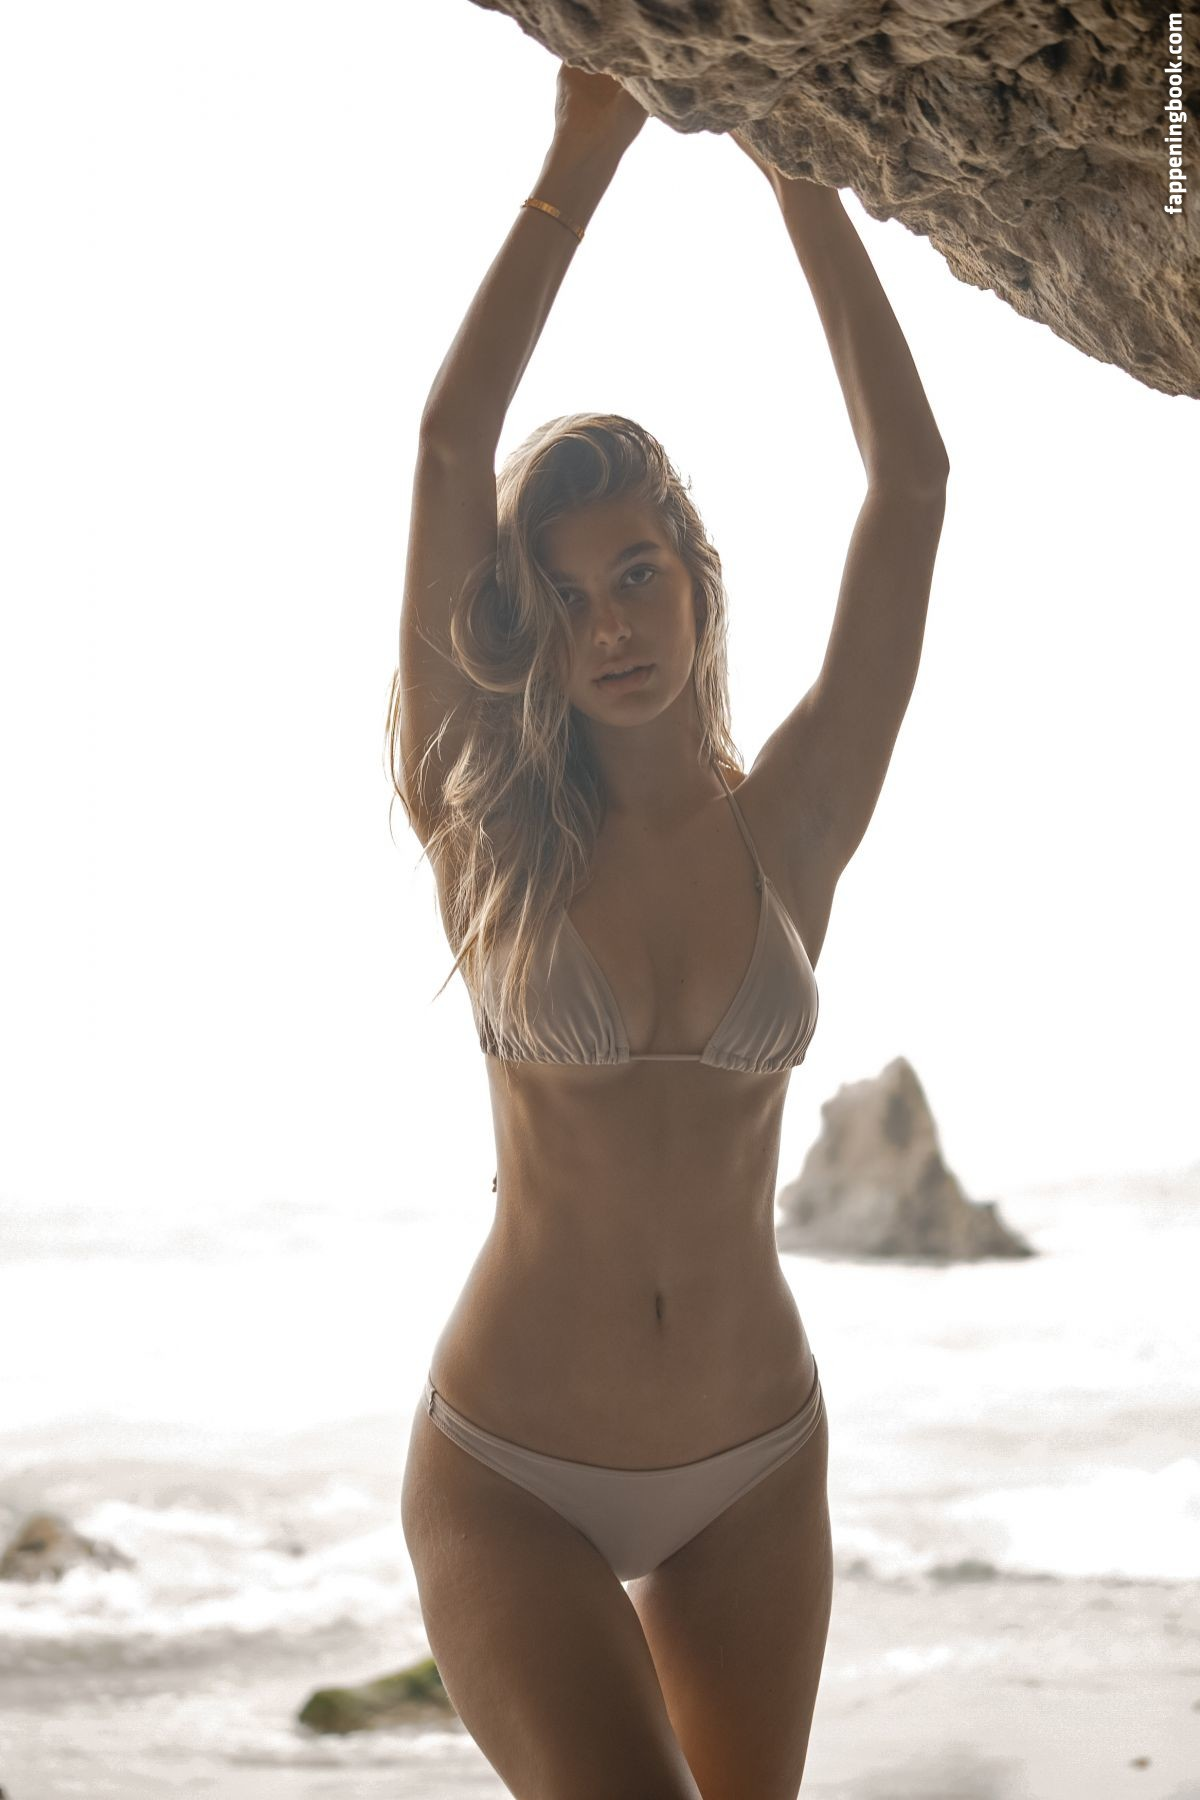 Nude camila morrone Stunning Pics